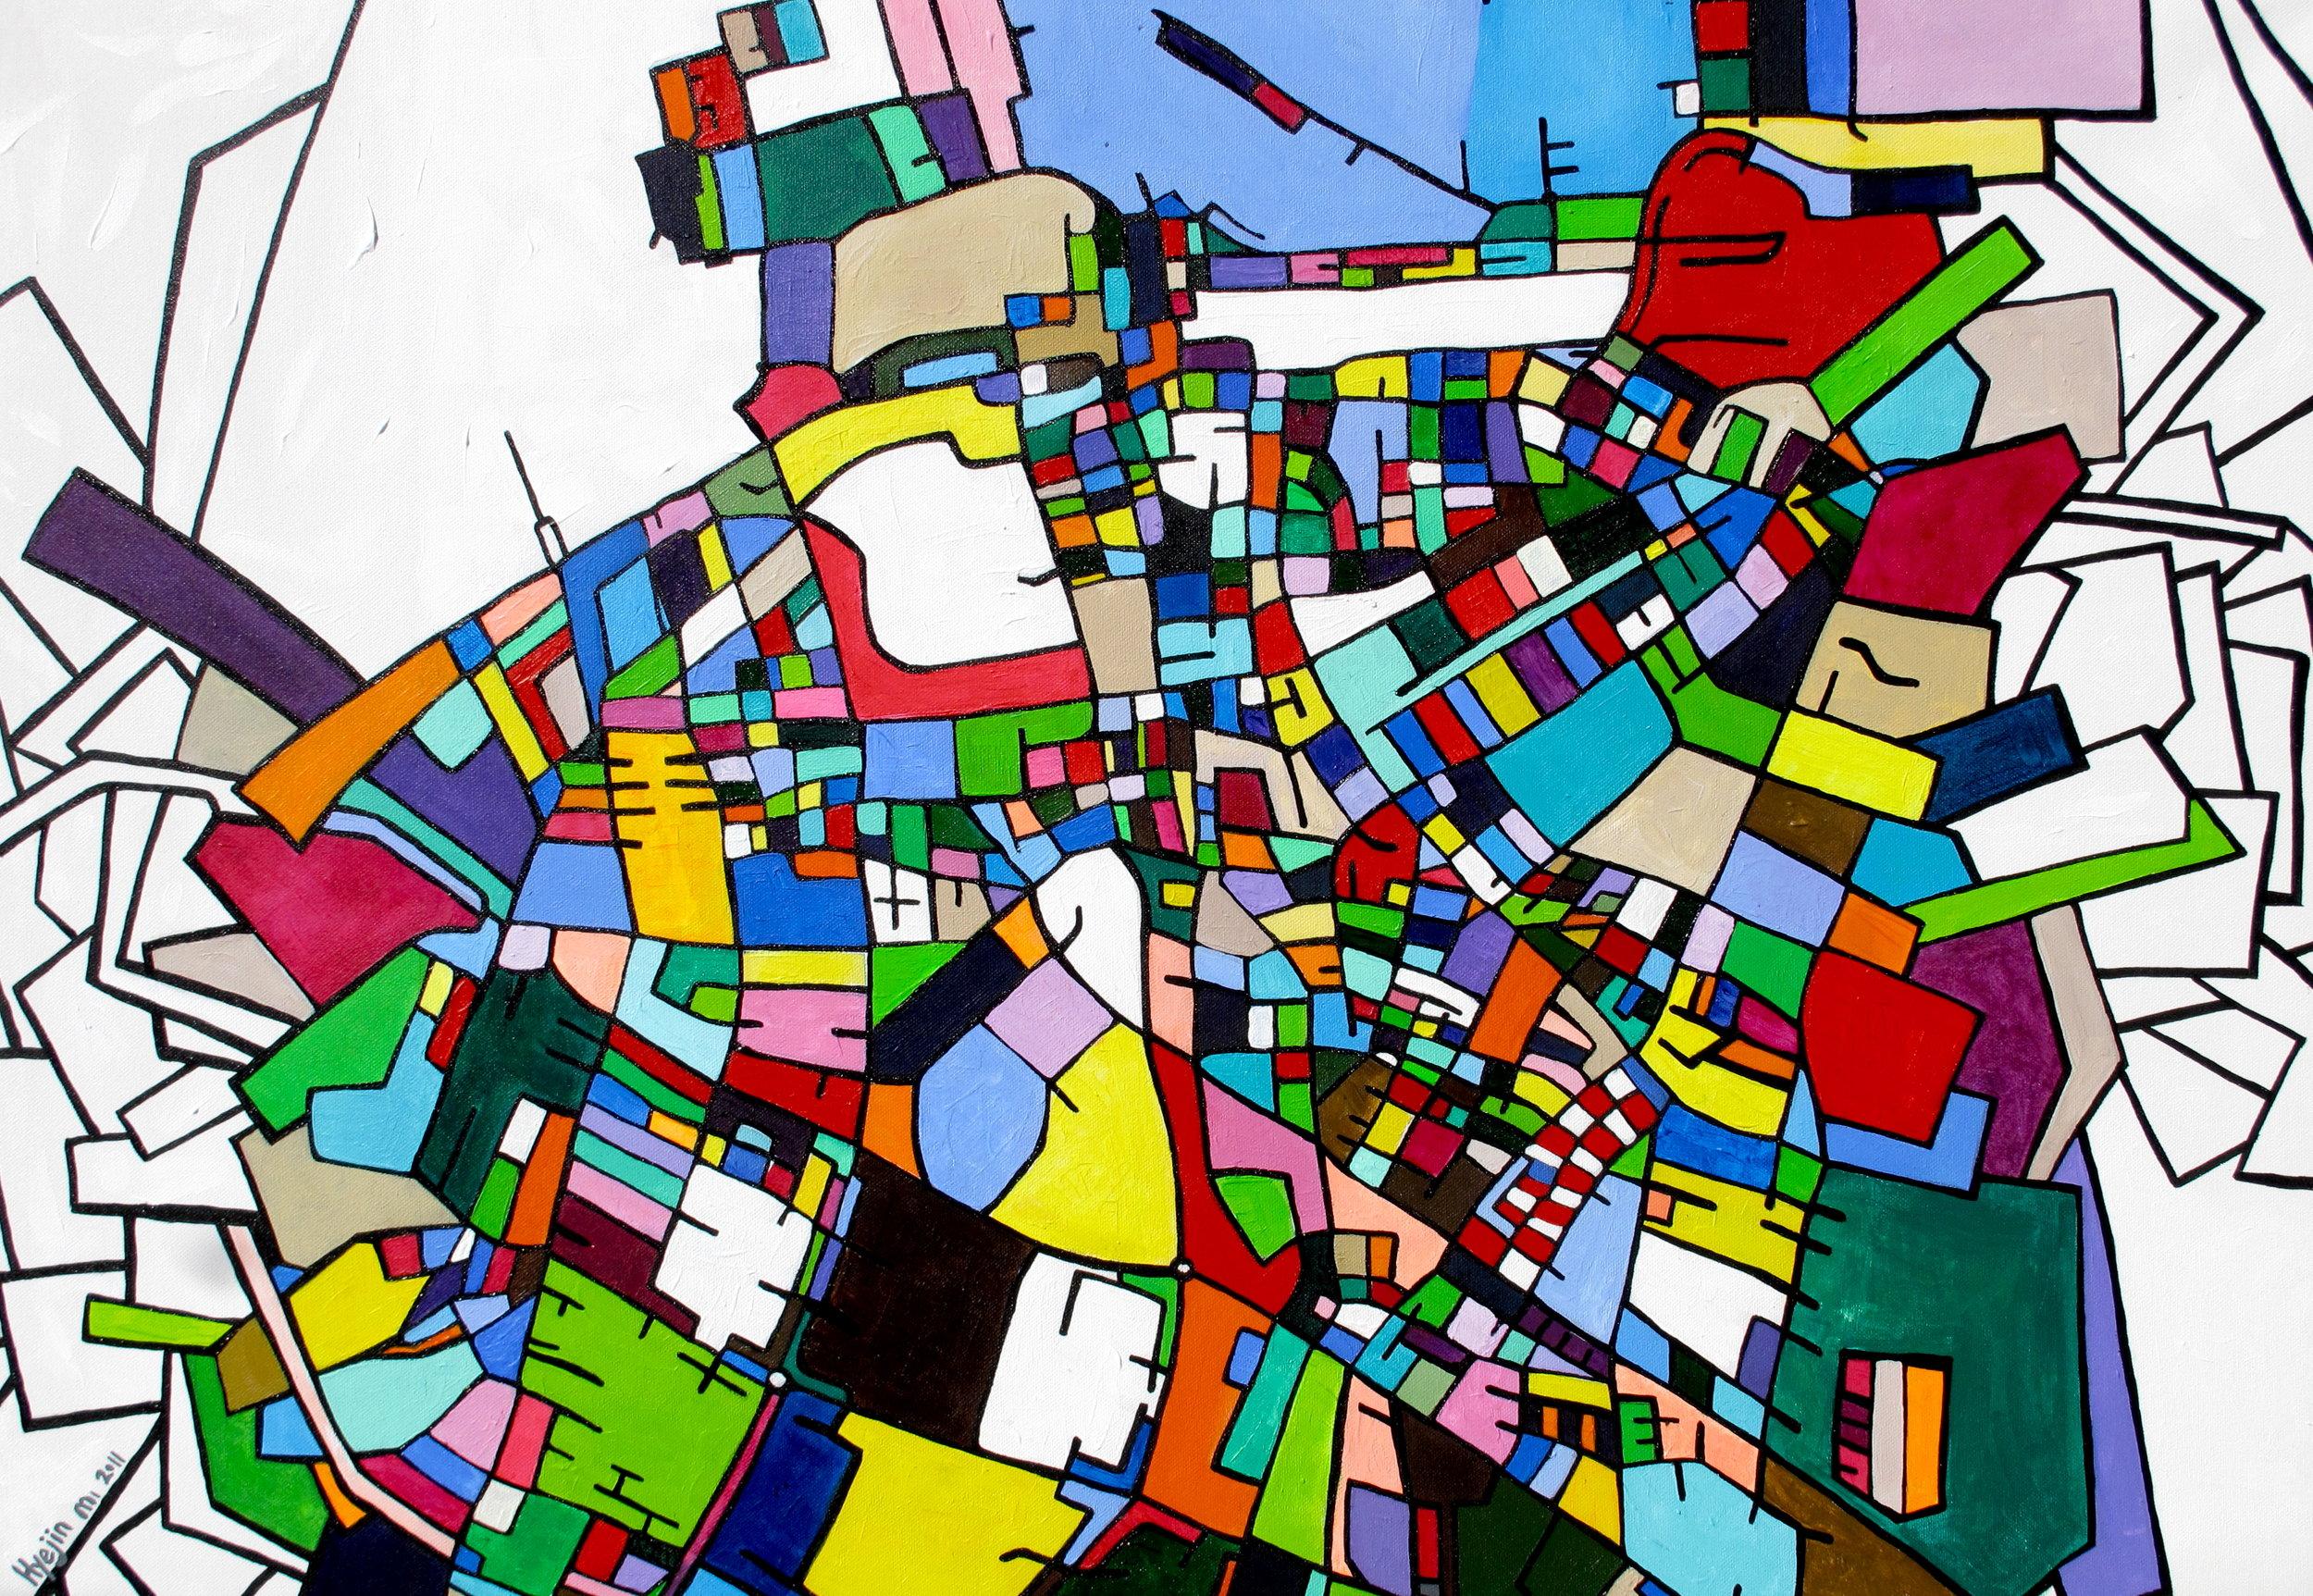 MALMO, 100 x 70cm, Acrylic on canvas